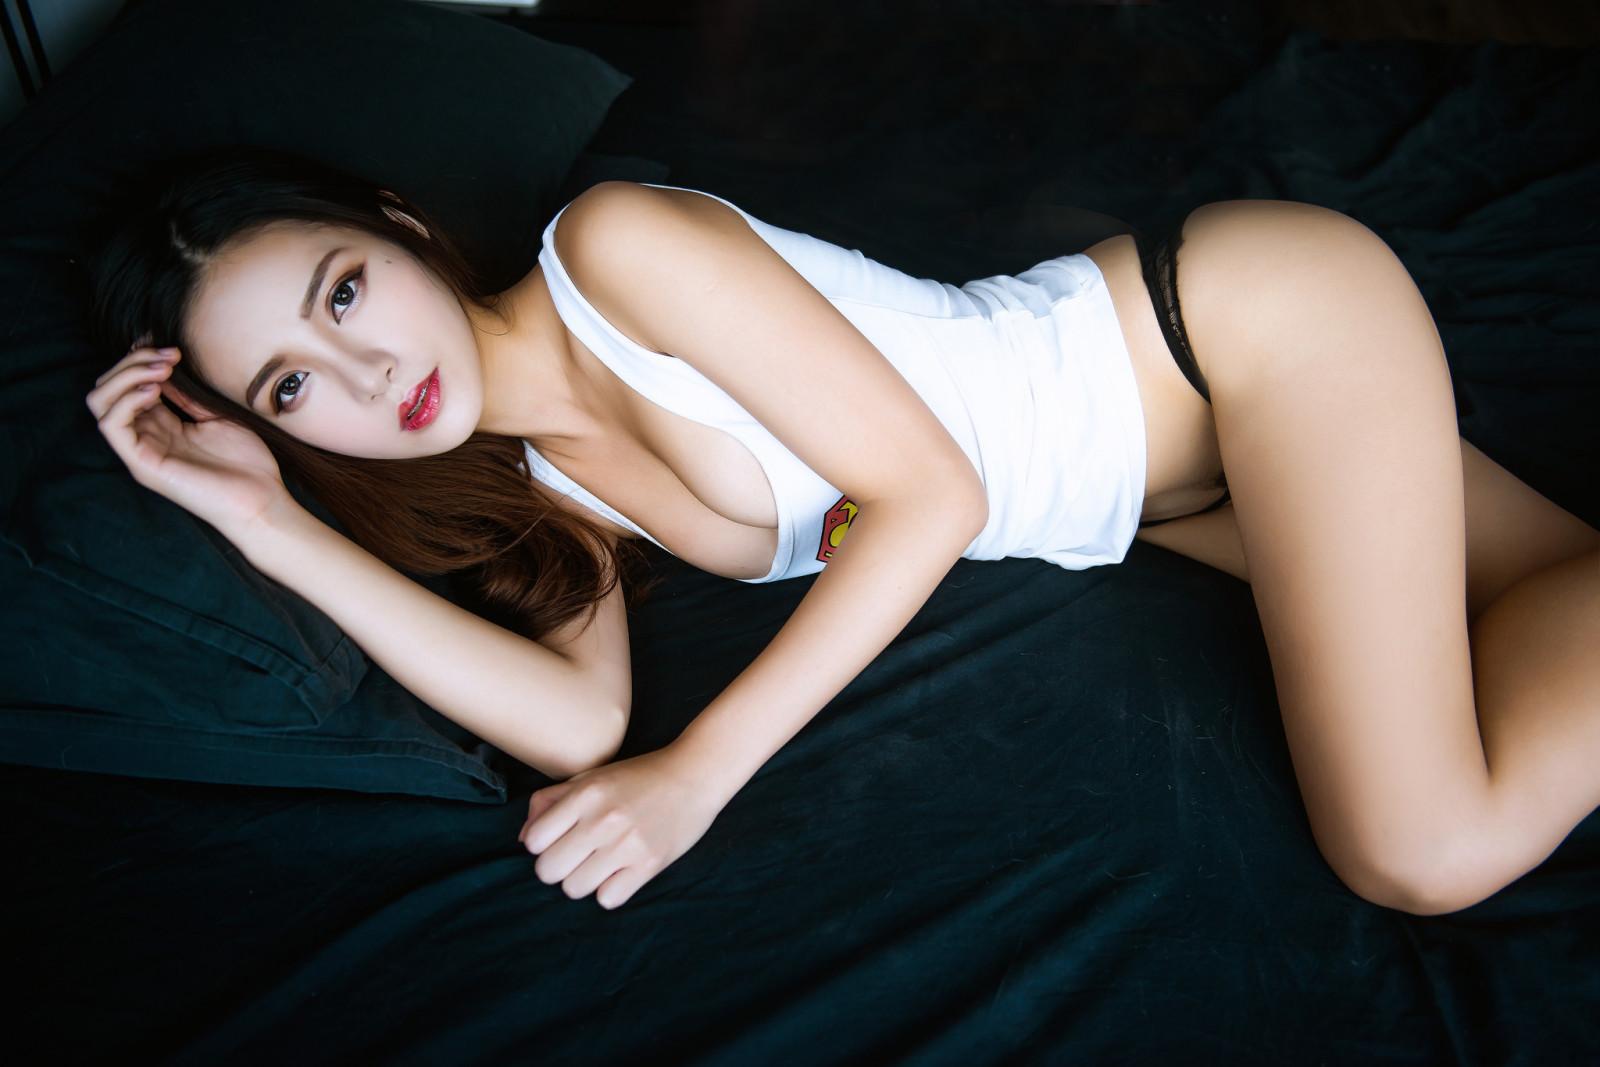 Asian model photo galleries, lynda carter naked gifs